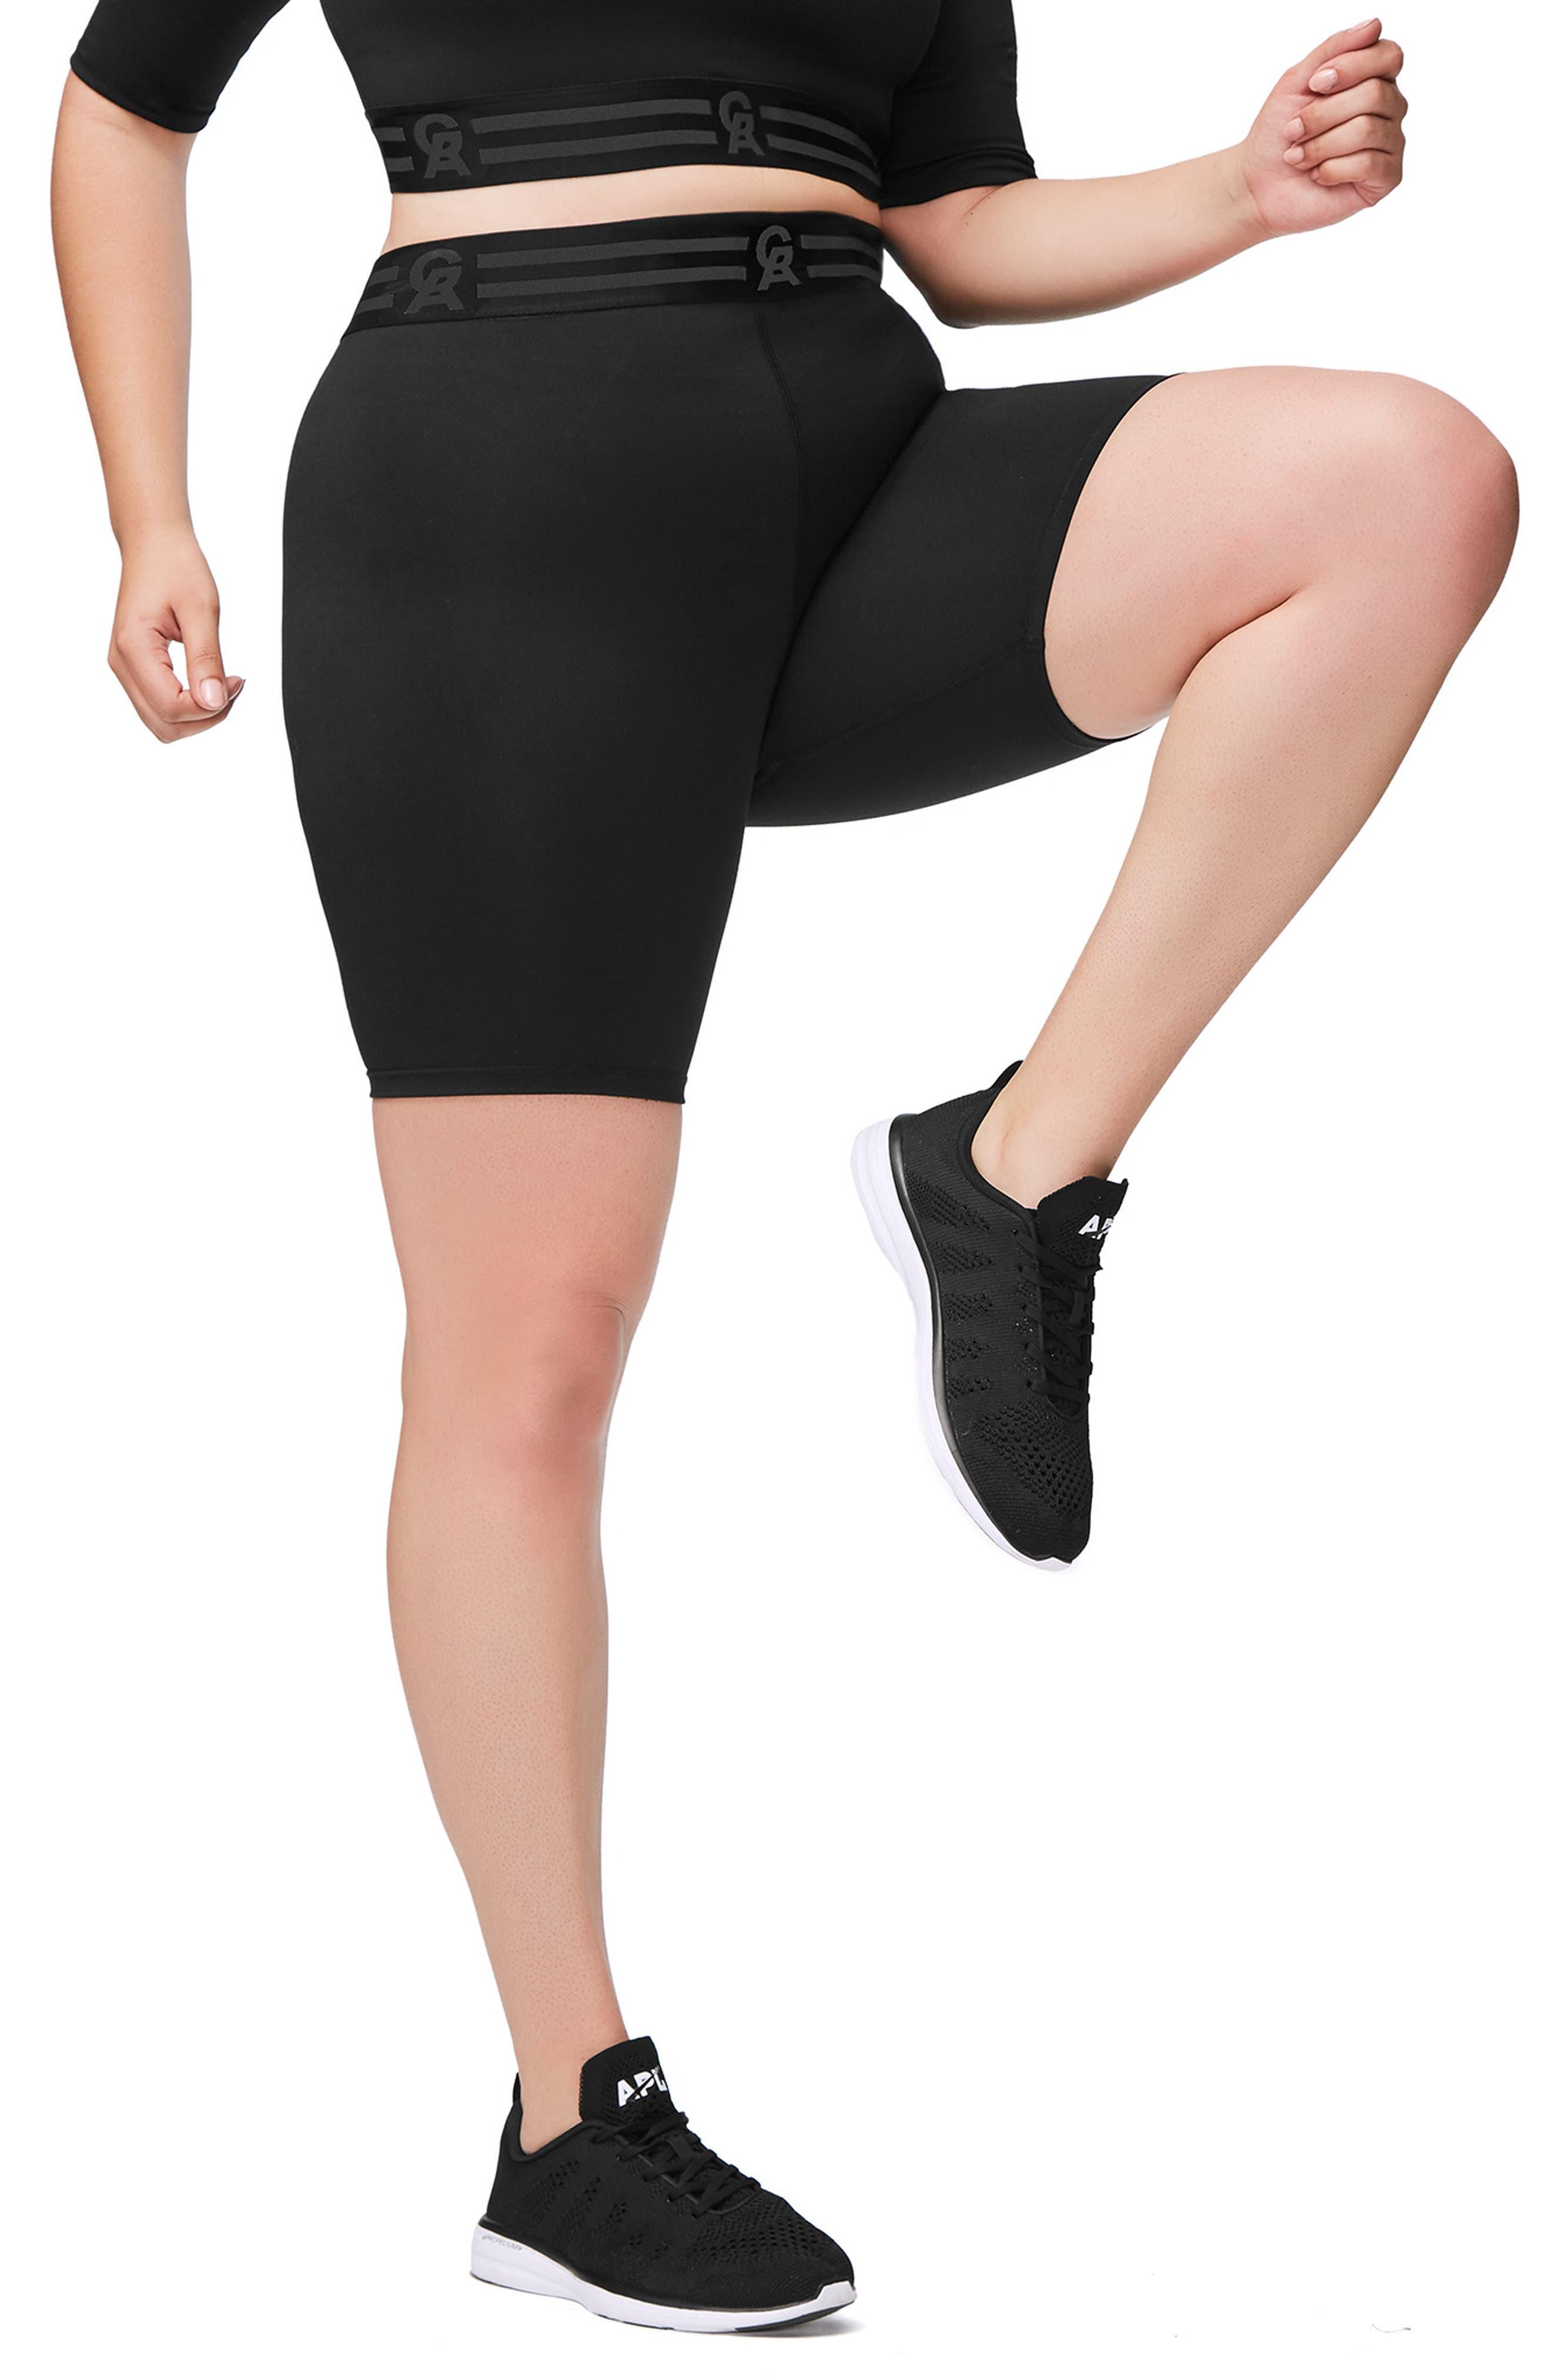 Icon High Waist Biker Shorts,                             Alternate thumbnail 9, color,                             BLACK001